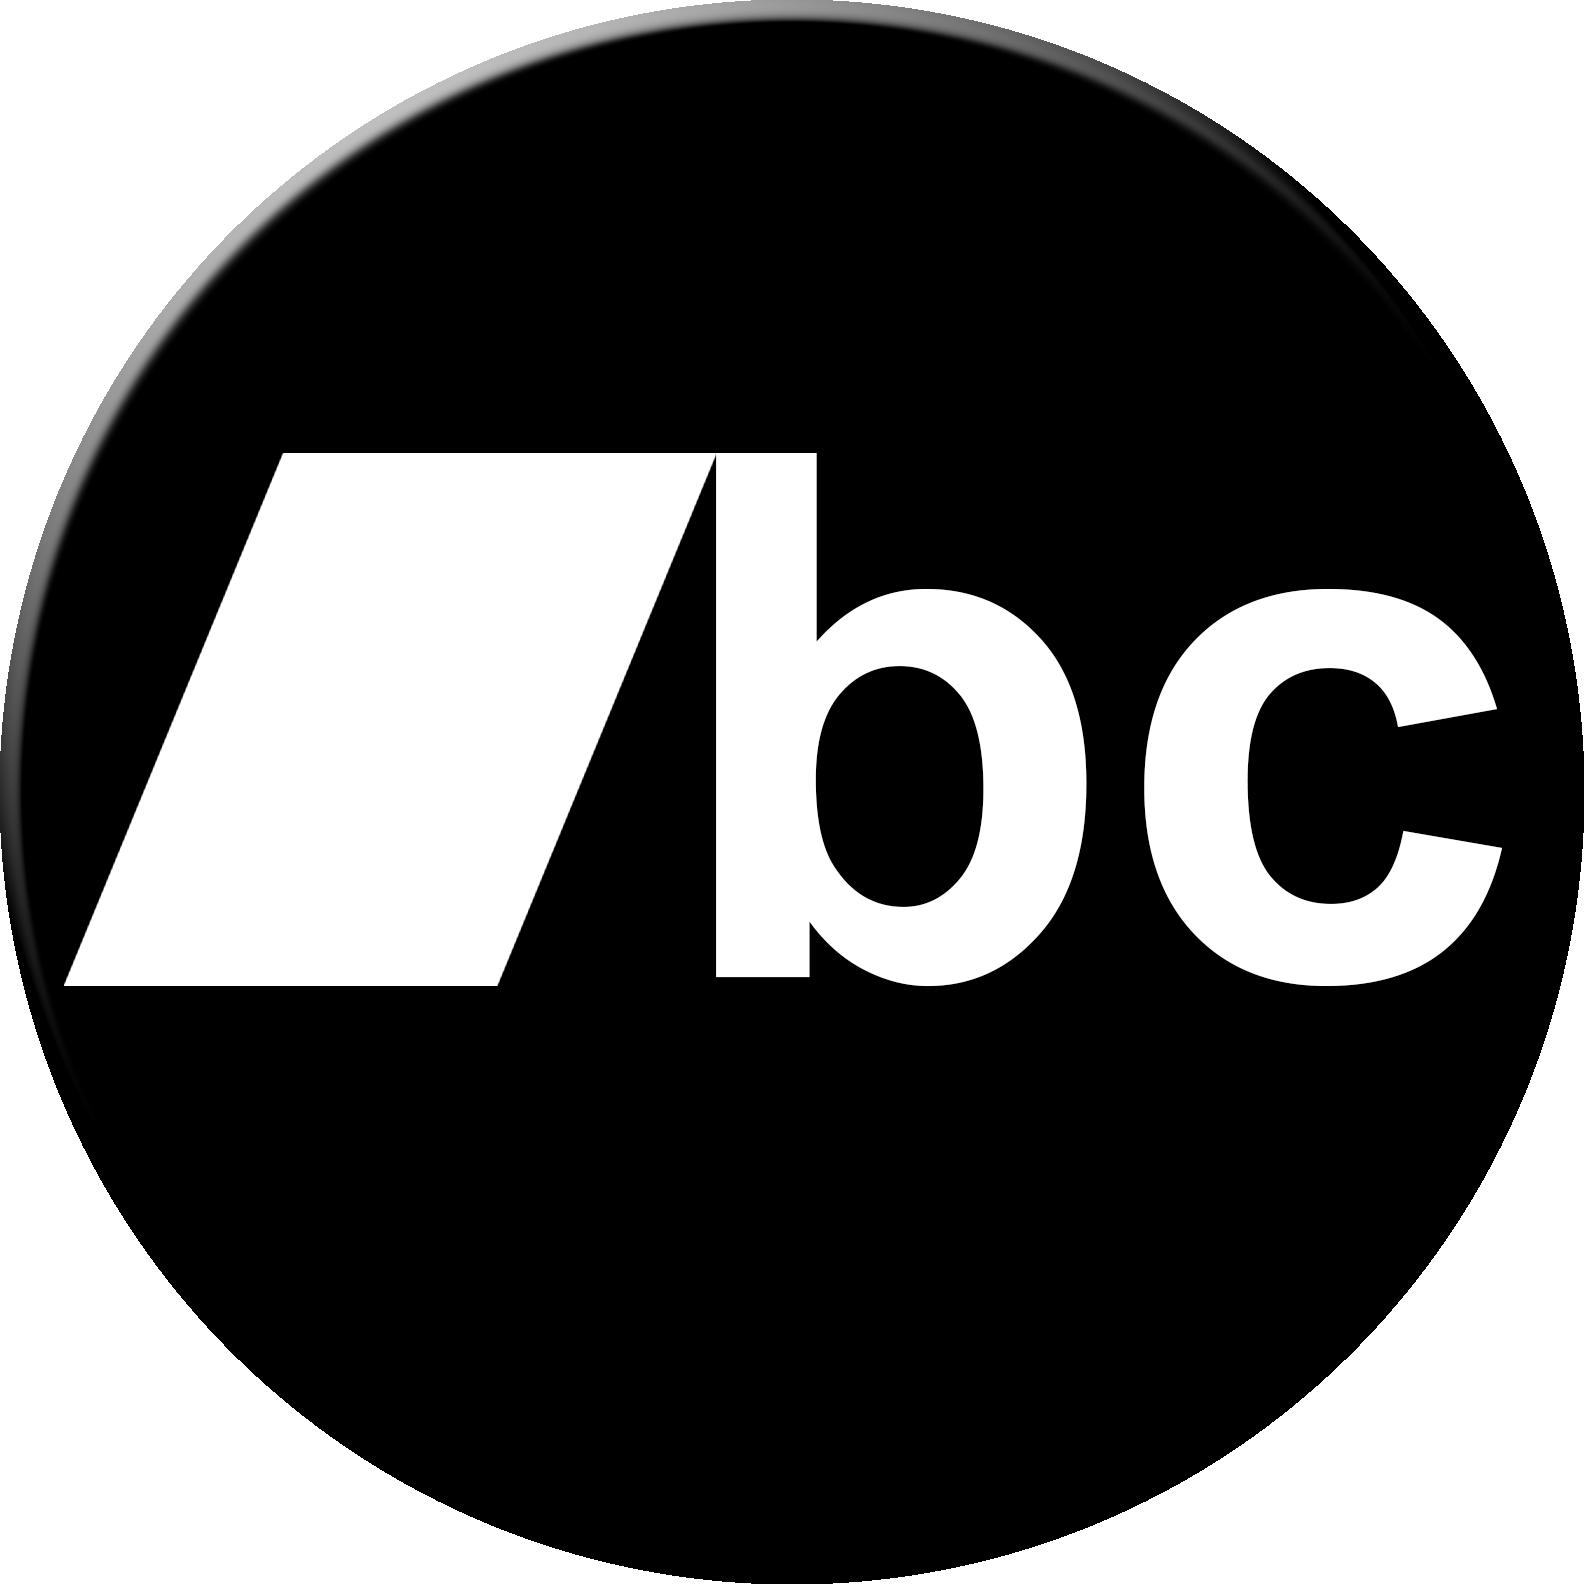 bandcamp logo 2017 - HD1584×1584